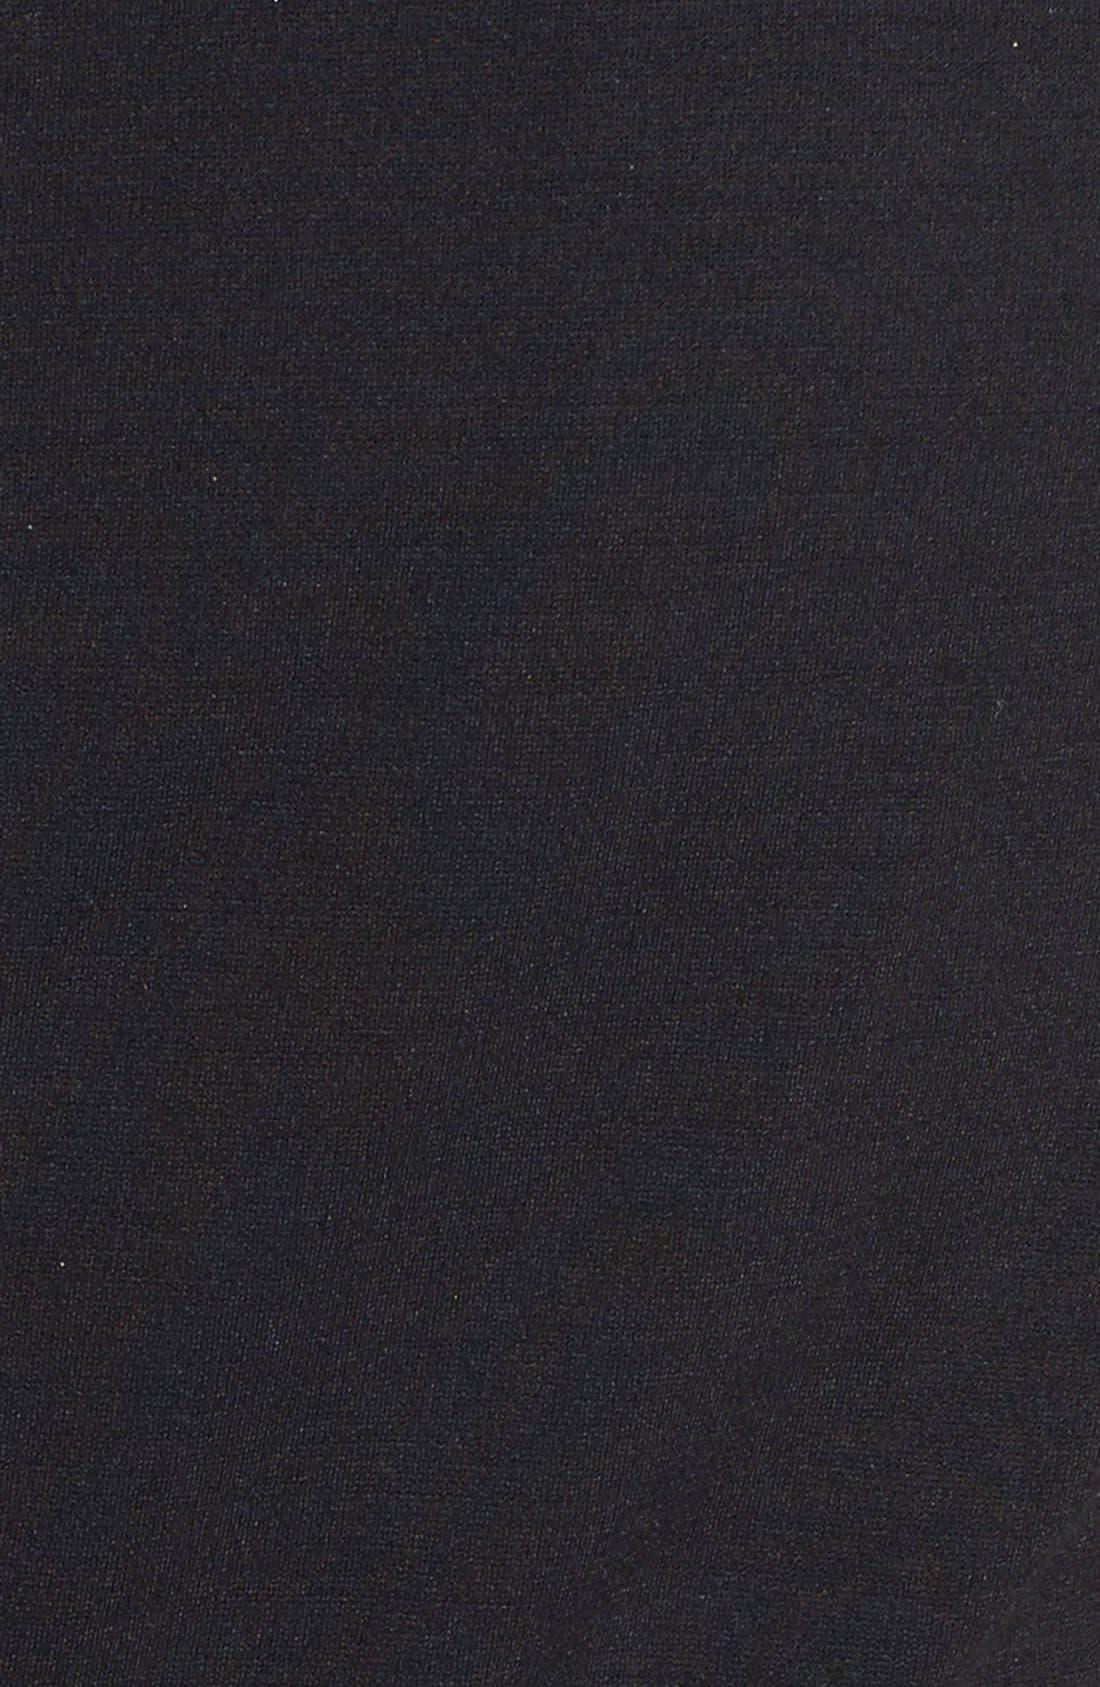 Alternate Image 4  - ERIN erin fetherston 'Shelby' Lace Panel Ponte Sheath Dress